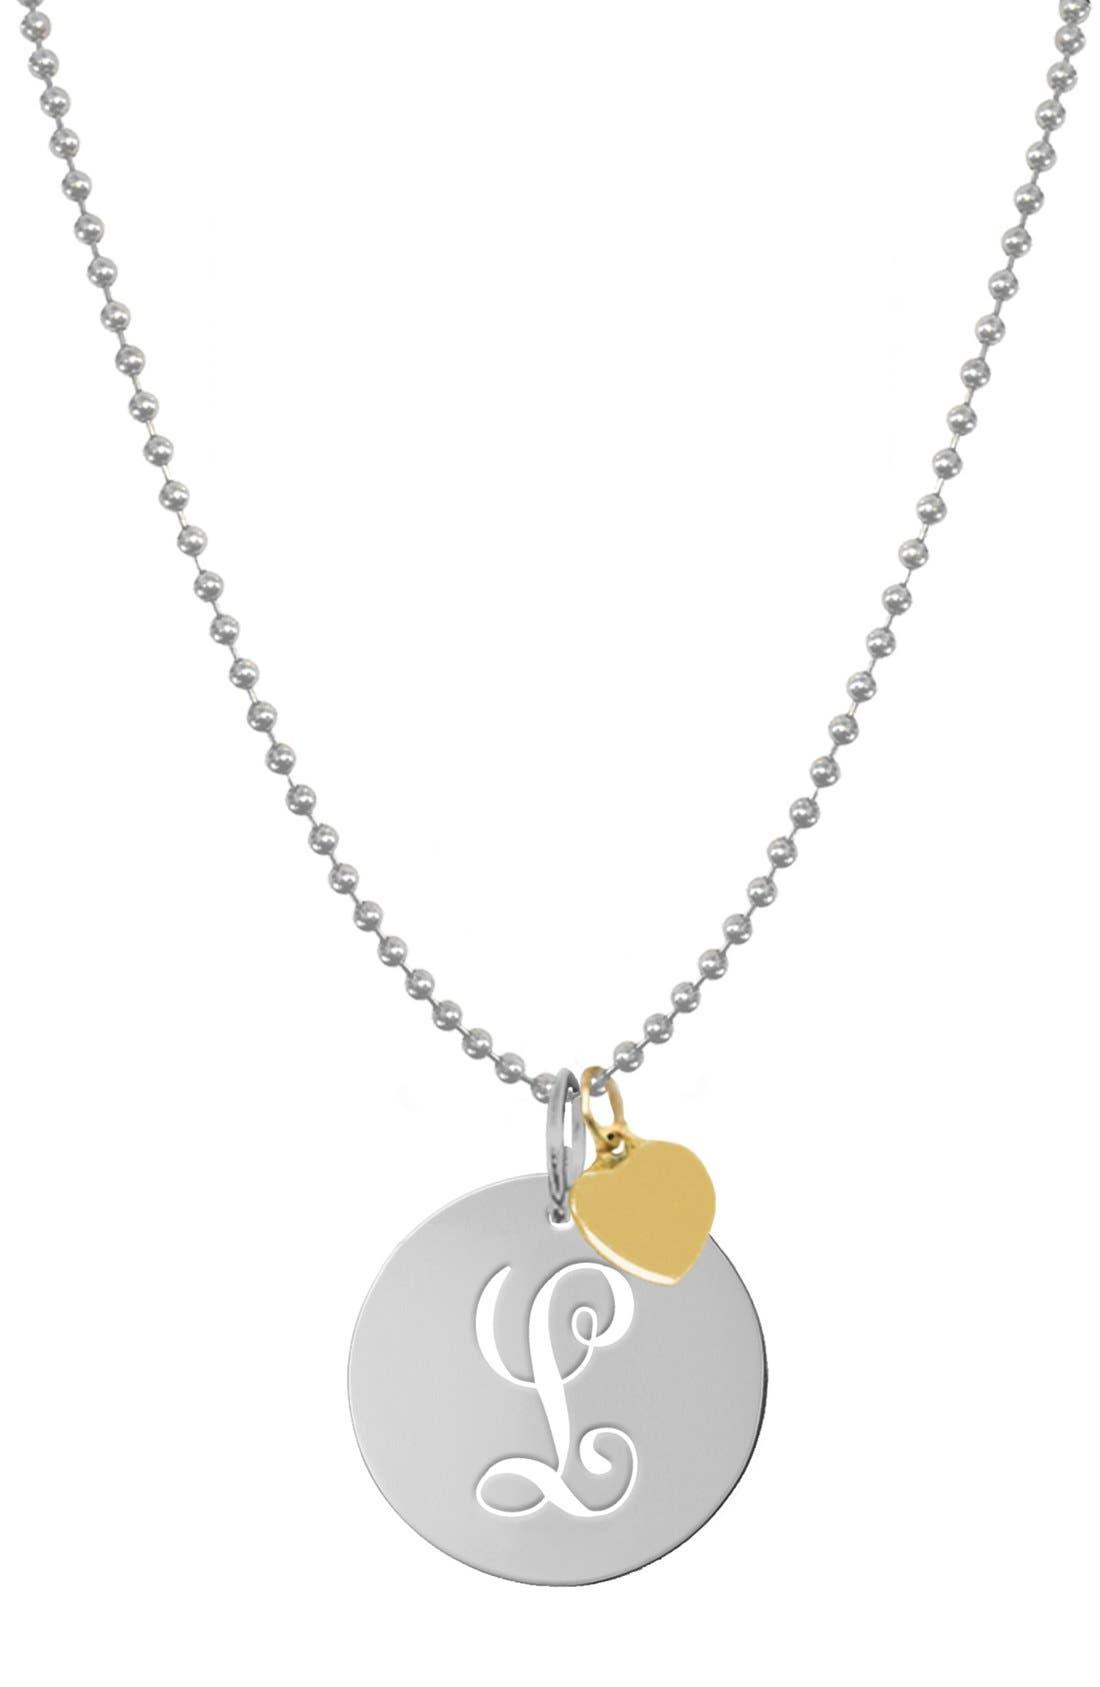 Main Image - Jane Basch Designs Personalized Script Initial Disc Pendant Necklace